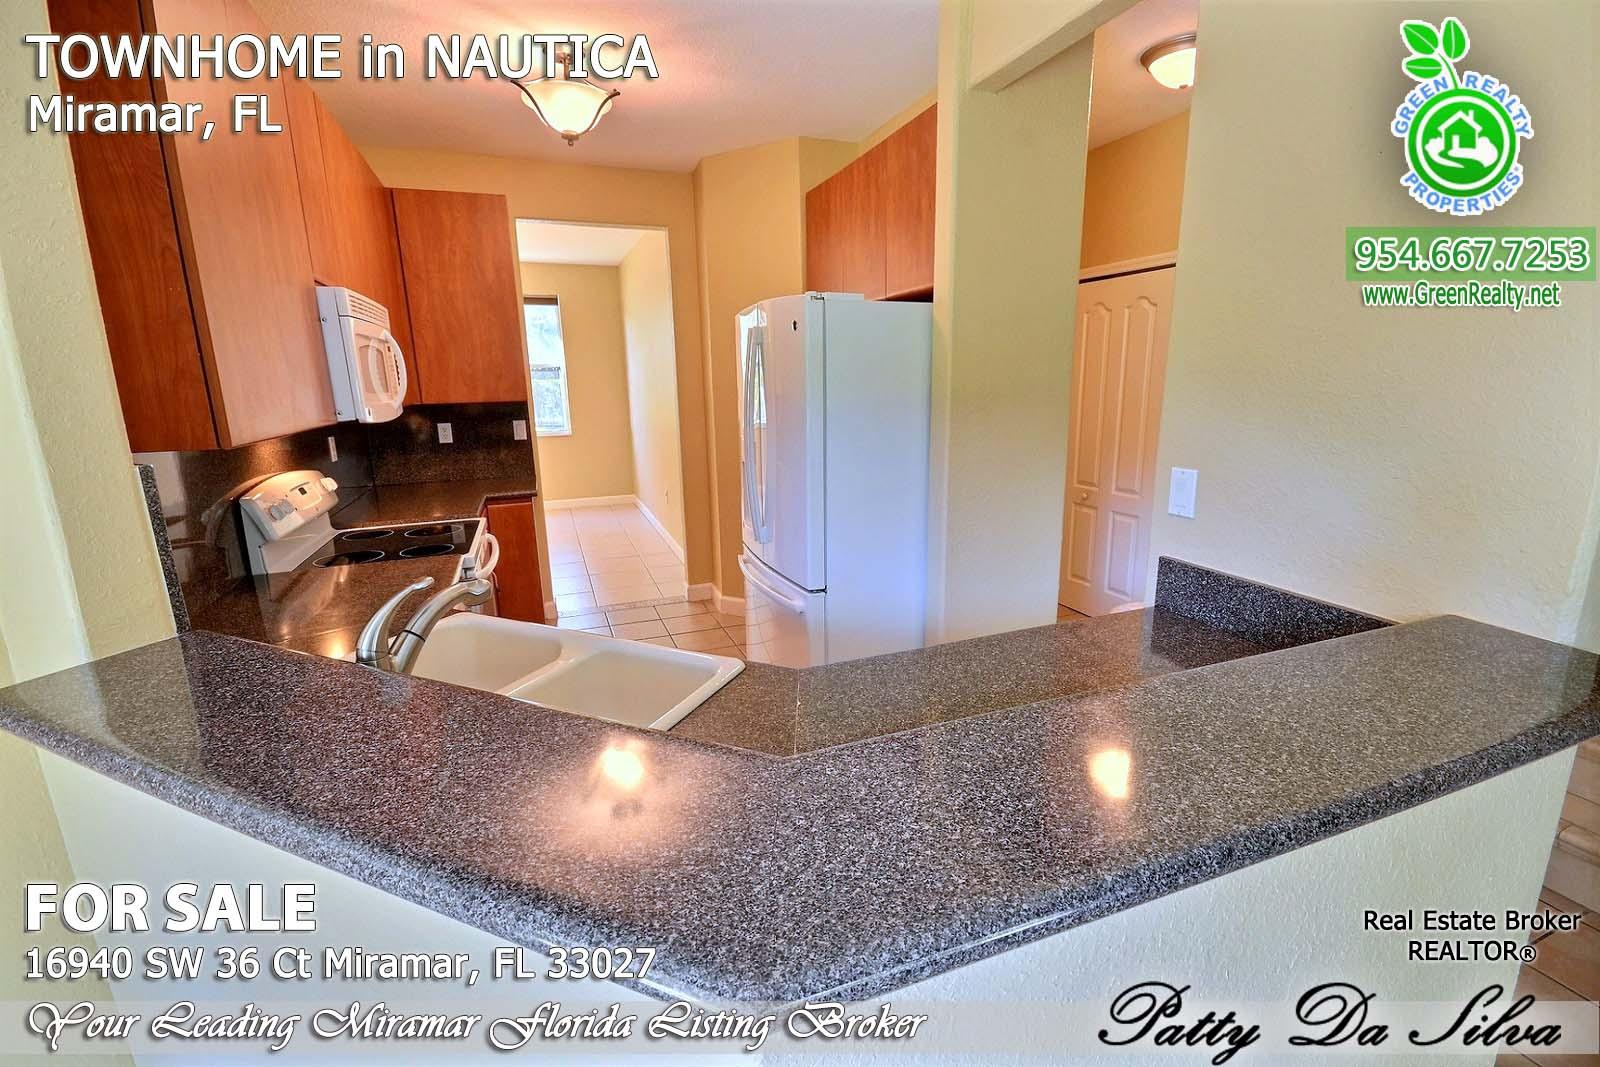 16940 SW 36 Ct Miramar, FL 33027 - Nautica Miramar Homes For Sale (12)